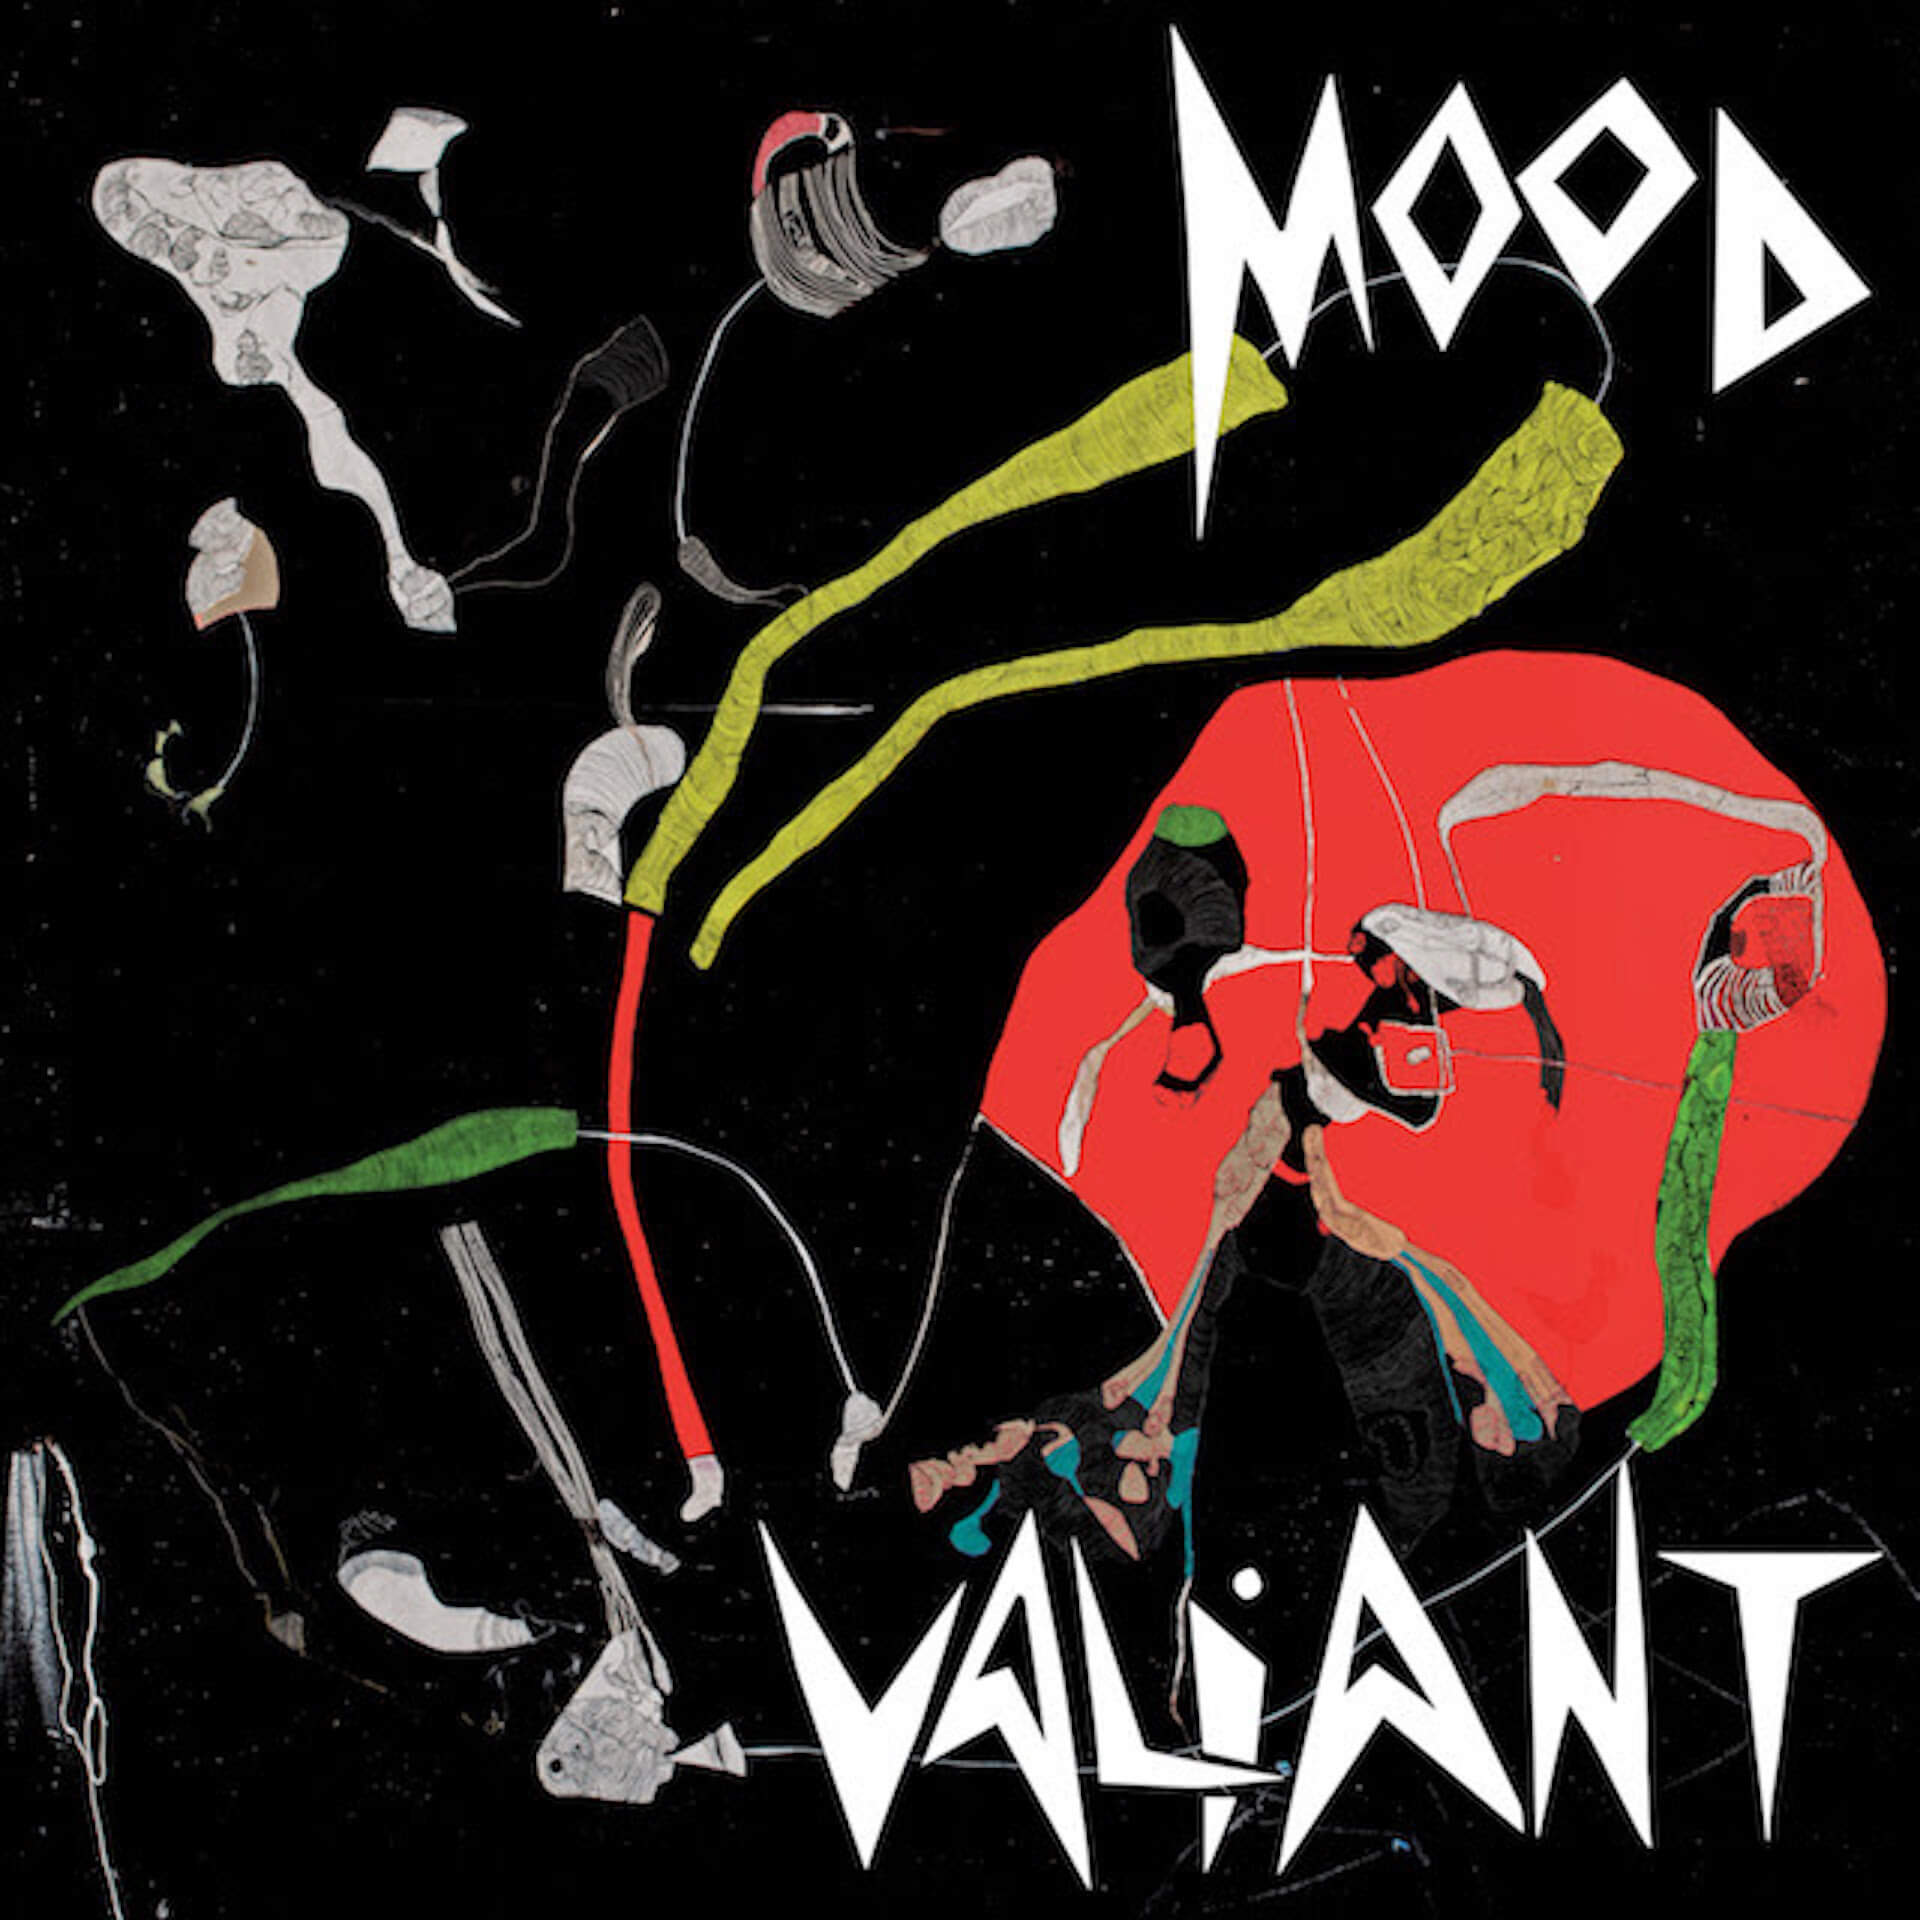 Hiatus KaiyoteがNPR「Tiny Desk Concert」に登場!最新作『Mood Valiant』より5曲を披露 music210805_hiatuskaiyote_3